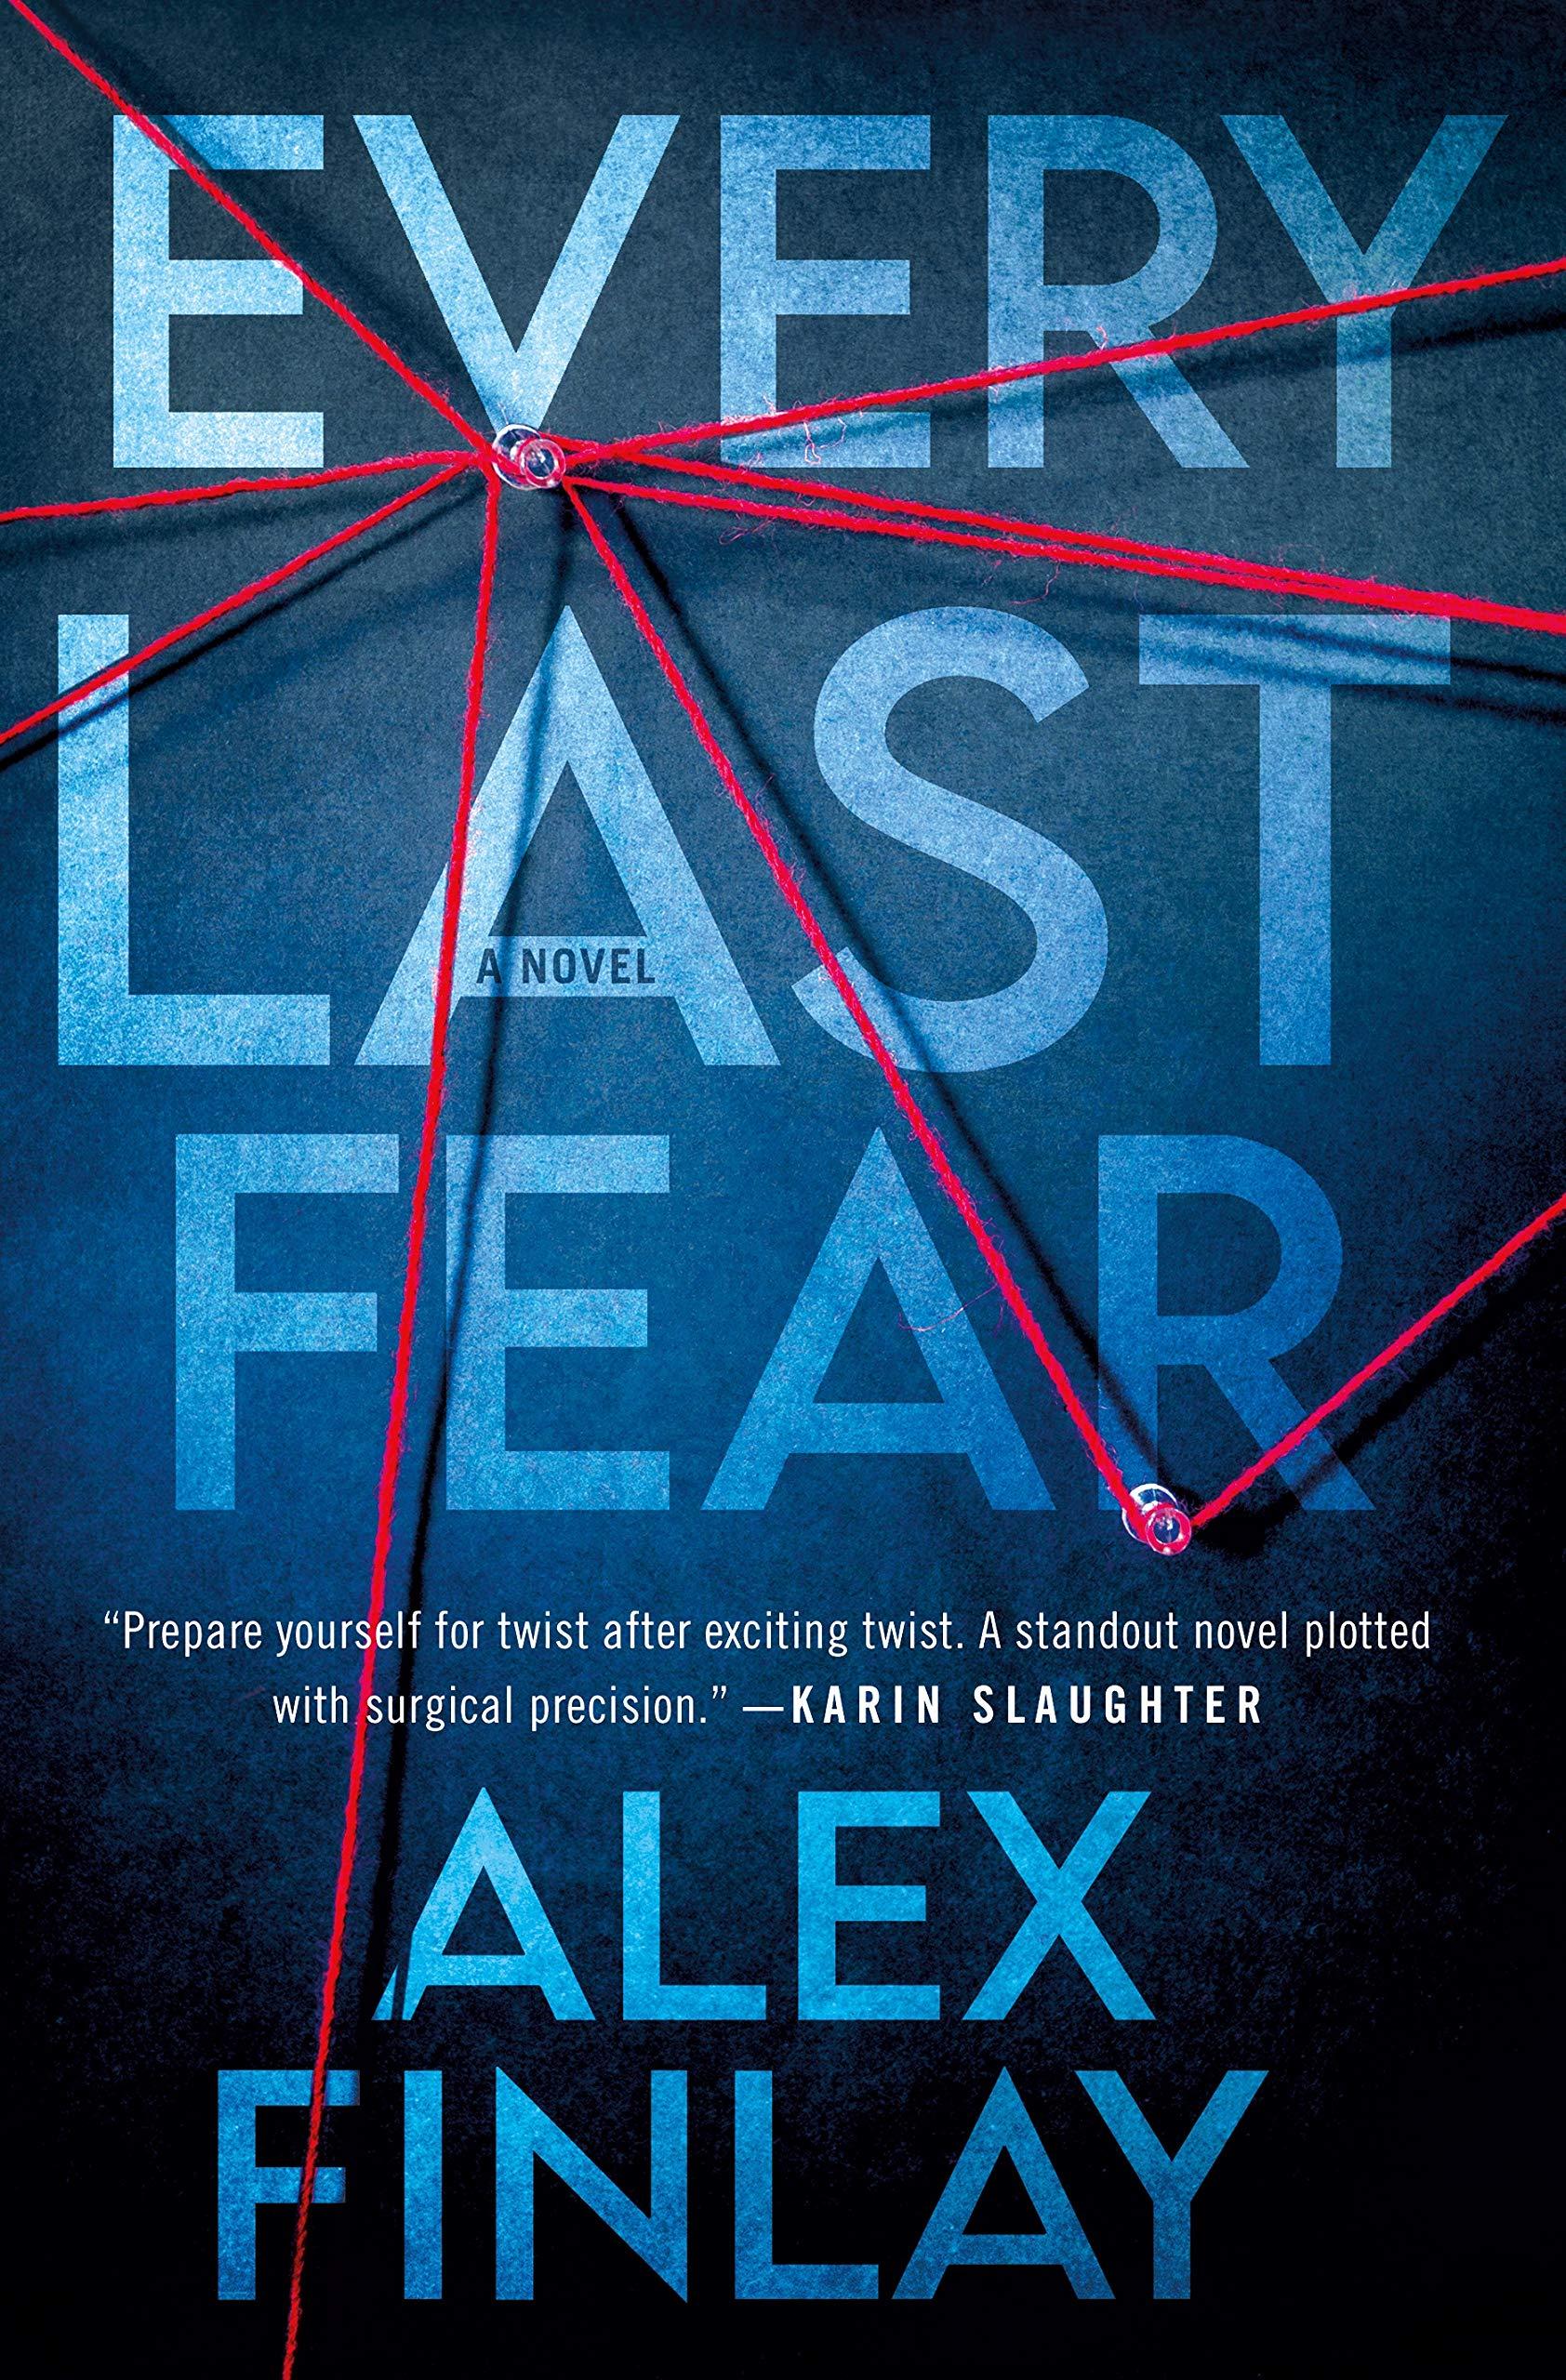 Every Last Fear: Amazon.co.uk: Finlay, Alex: 9781250268822: Books